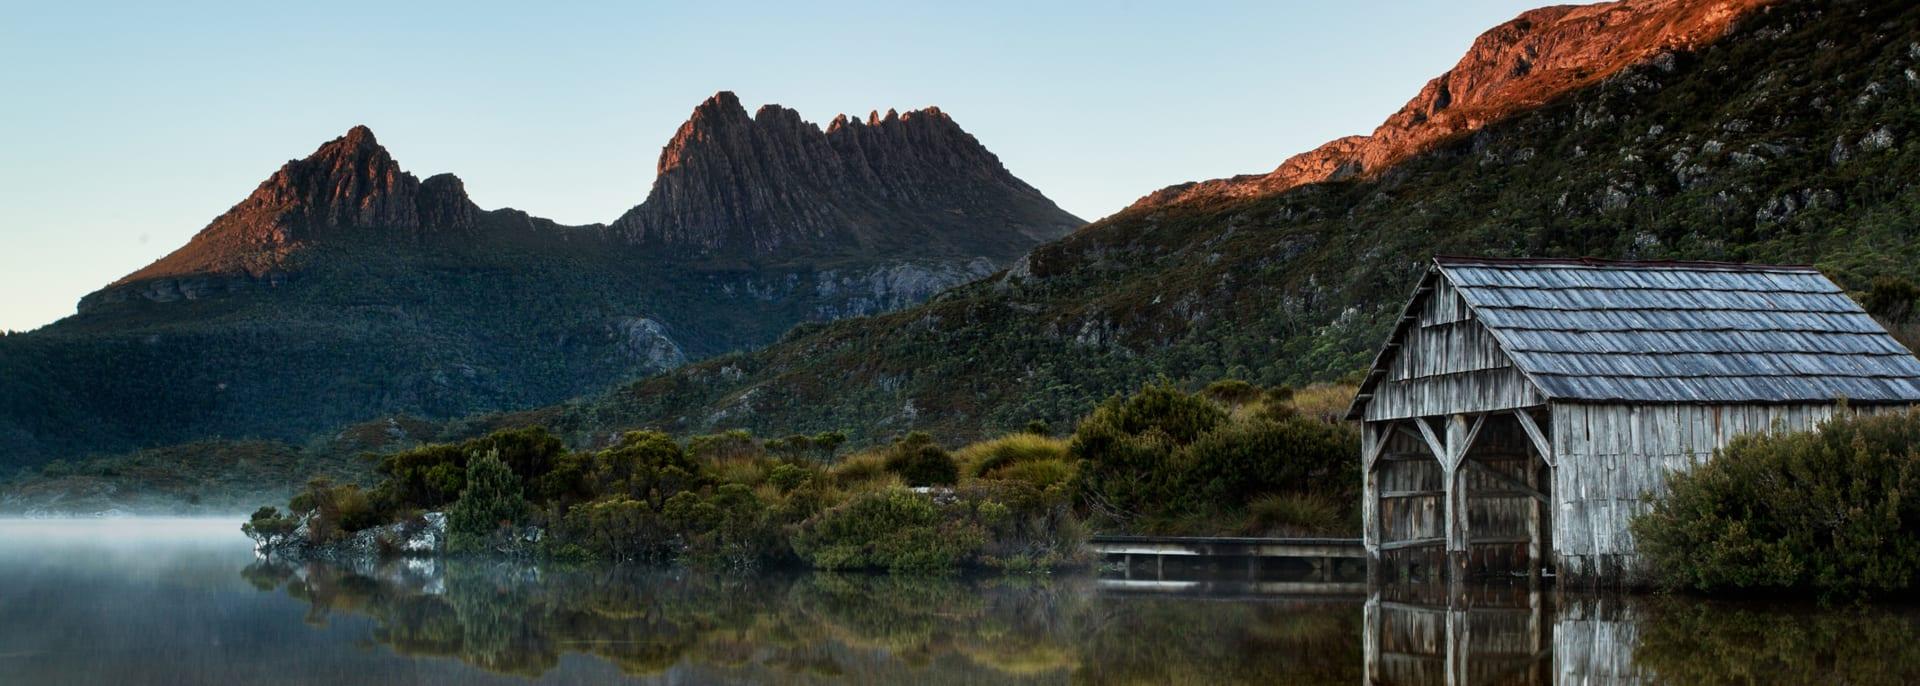 Cradle Mountain Nationalpark, Australia